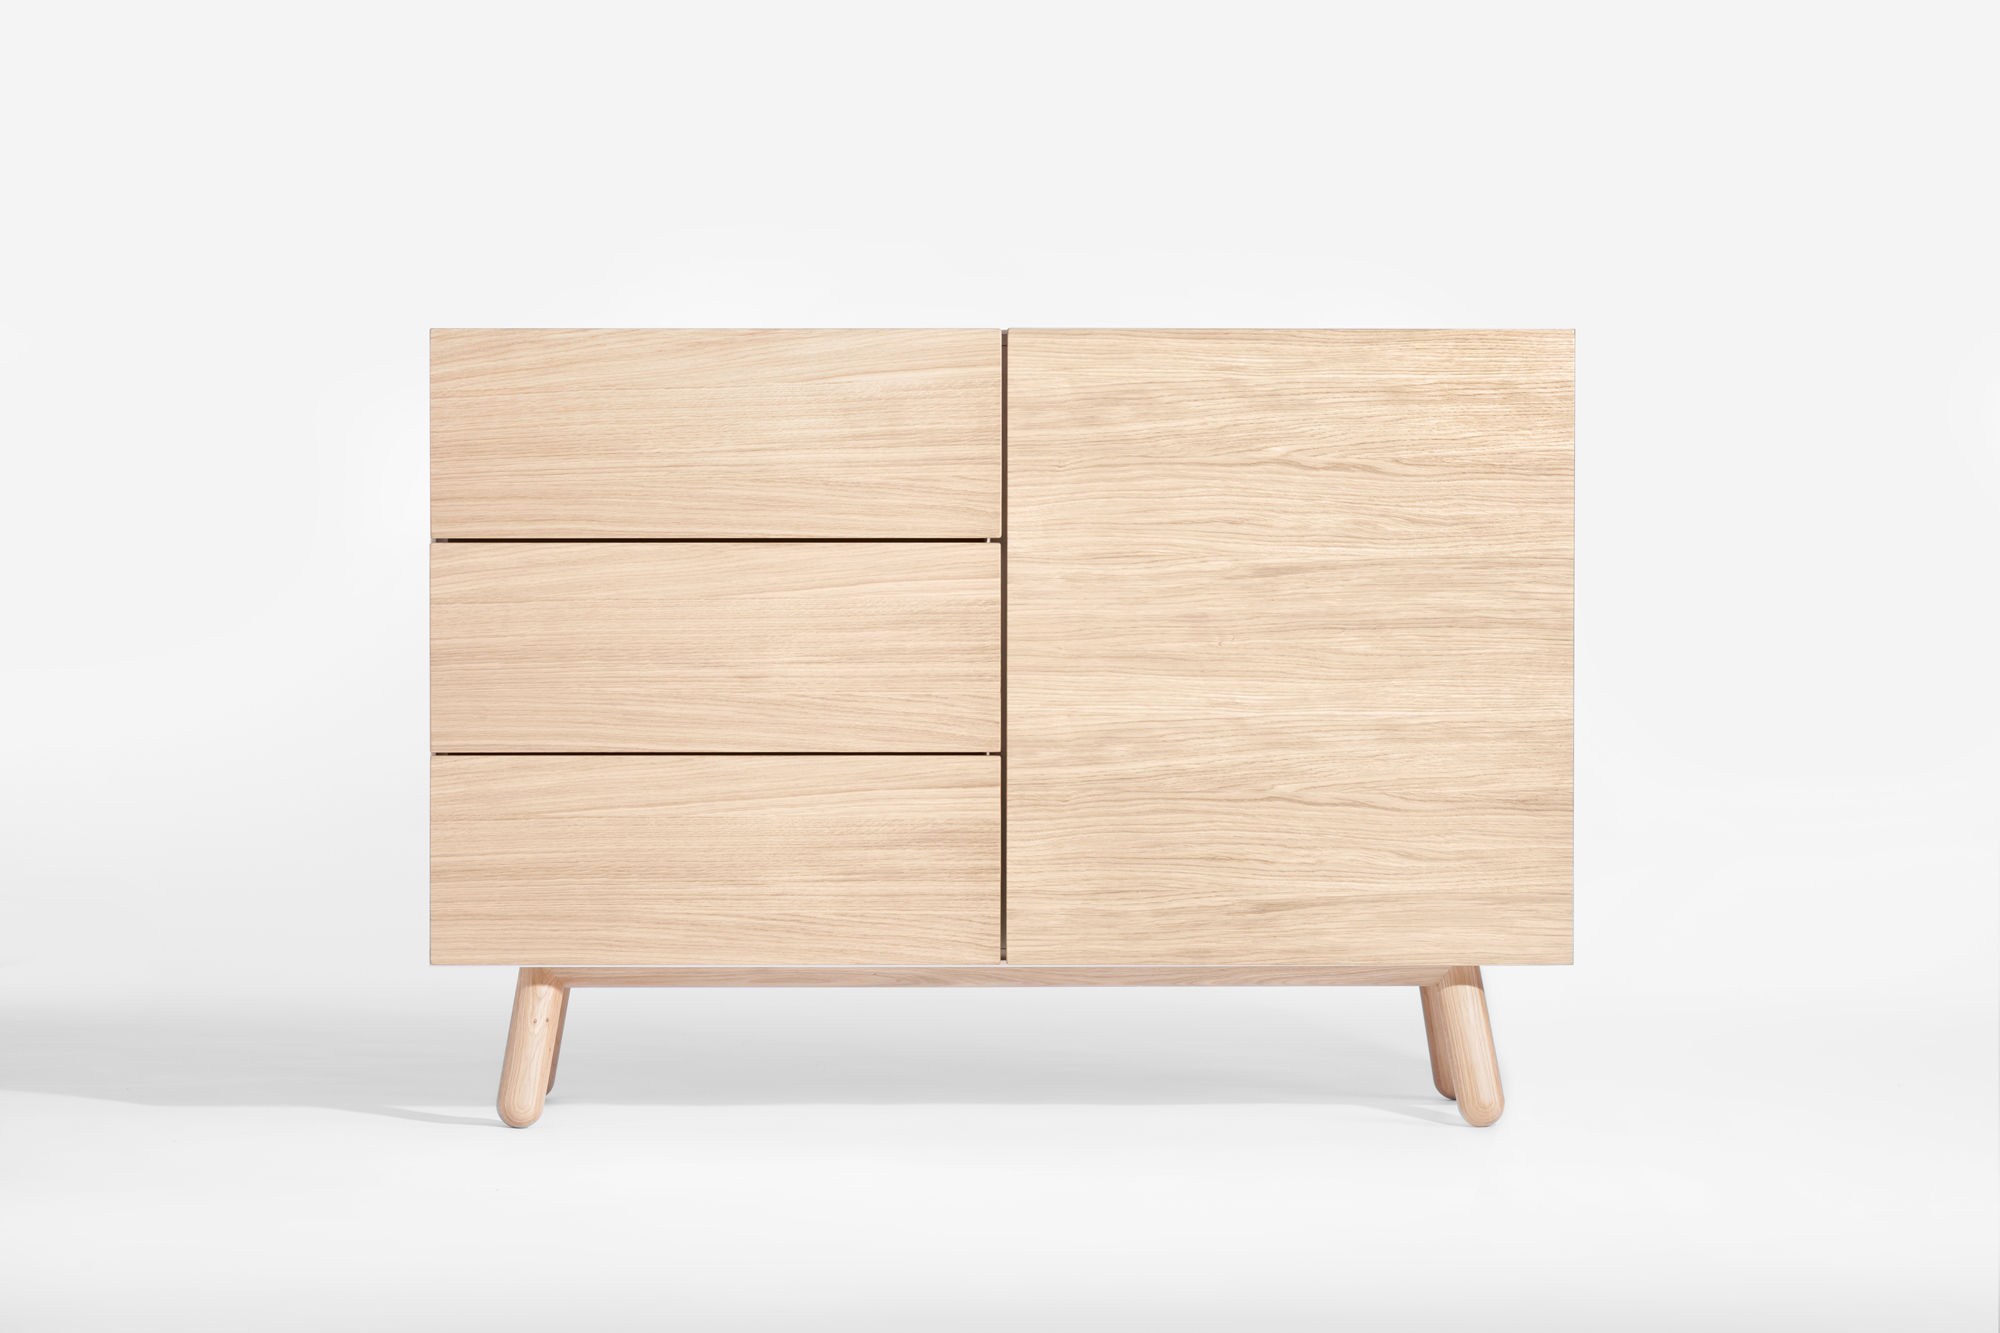 Comoda din lemn de stejar si furnir, cu 1 usa si 3 sertare, Mamma, l120xA42xH84 cm poza